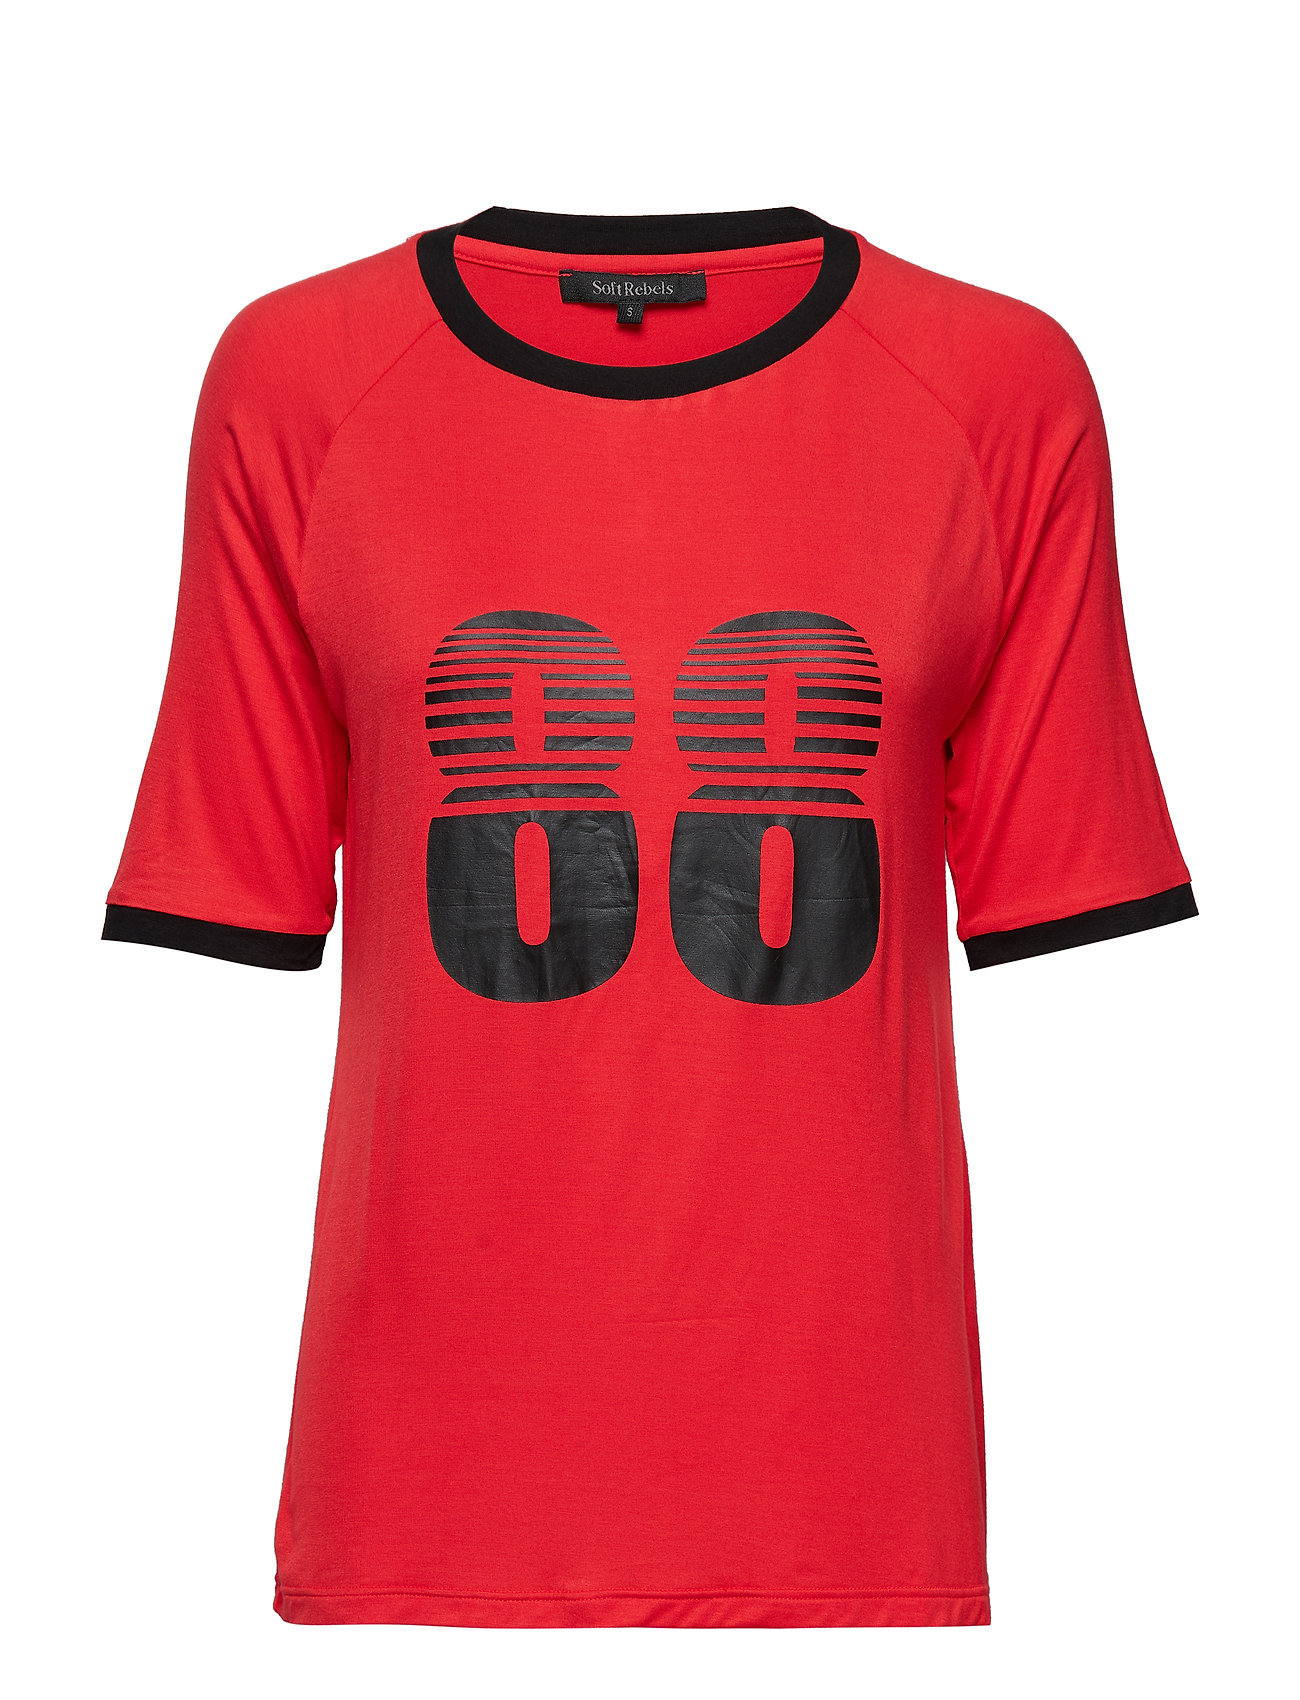 Soft Rebels Asta t-shirt - POPPY RED